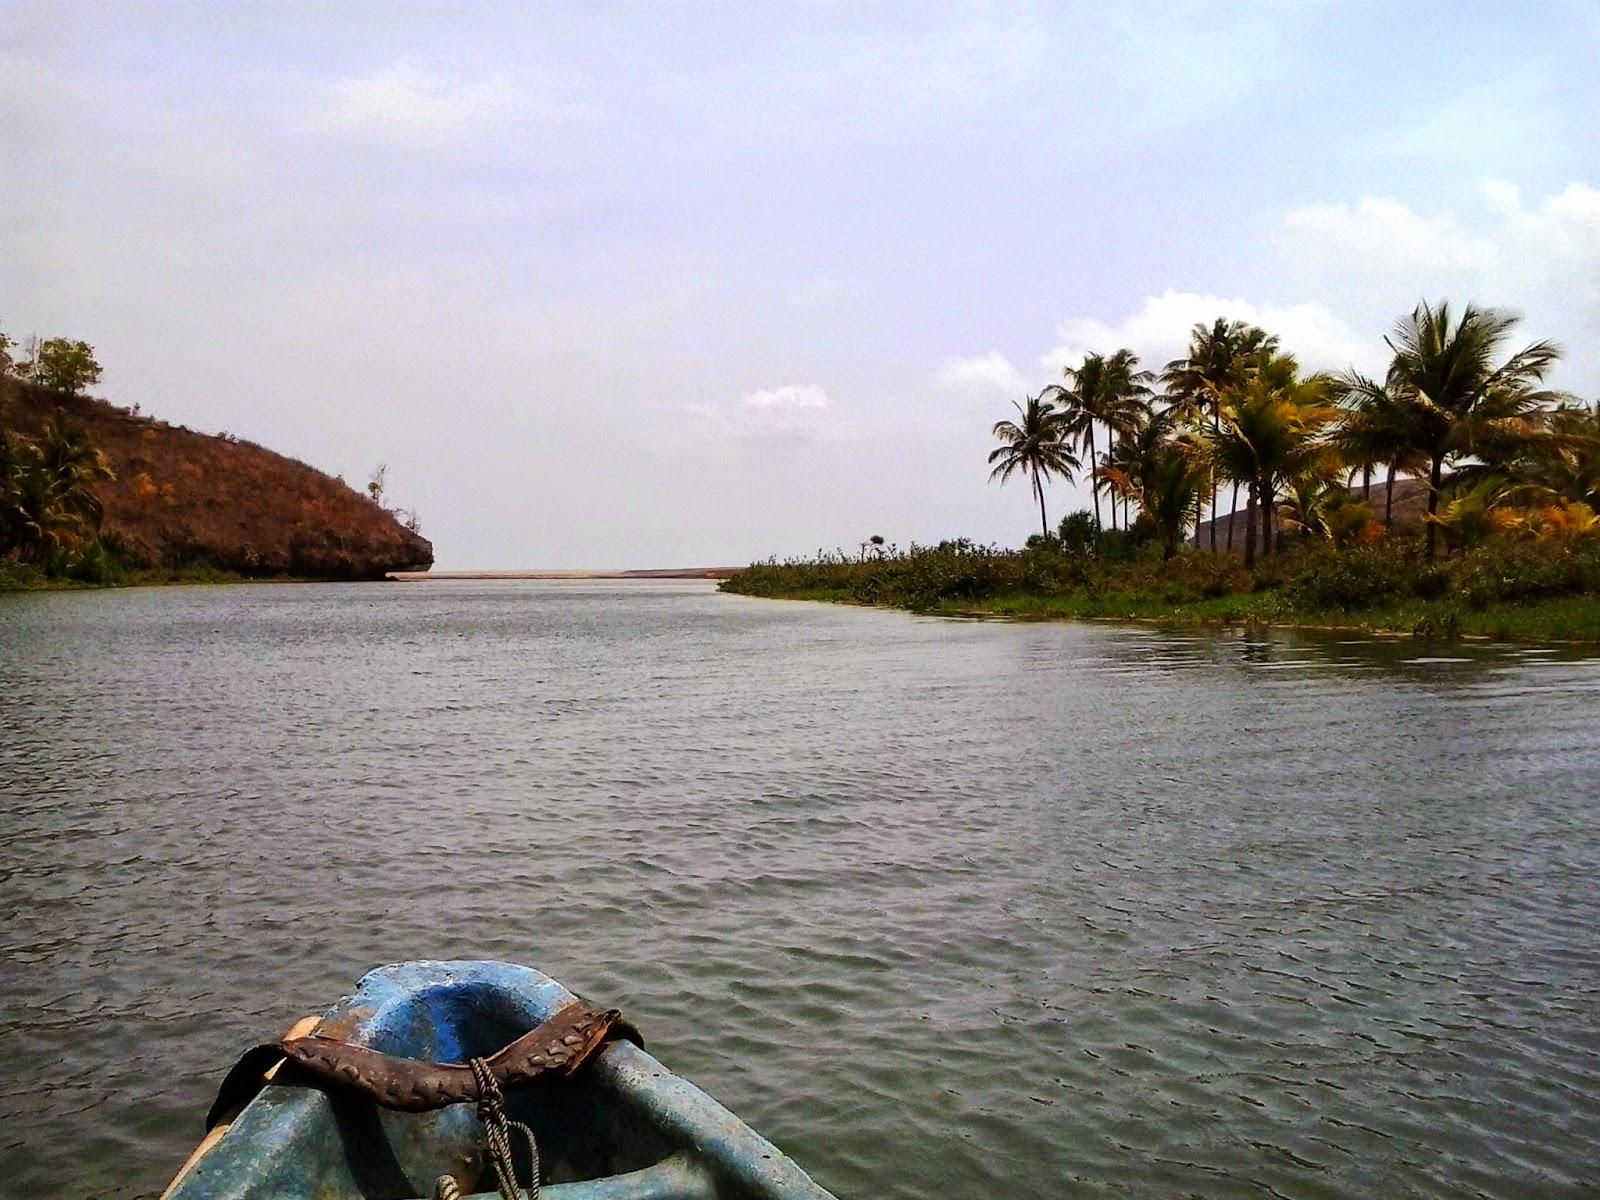 Wisata Air Sungai Maron